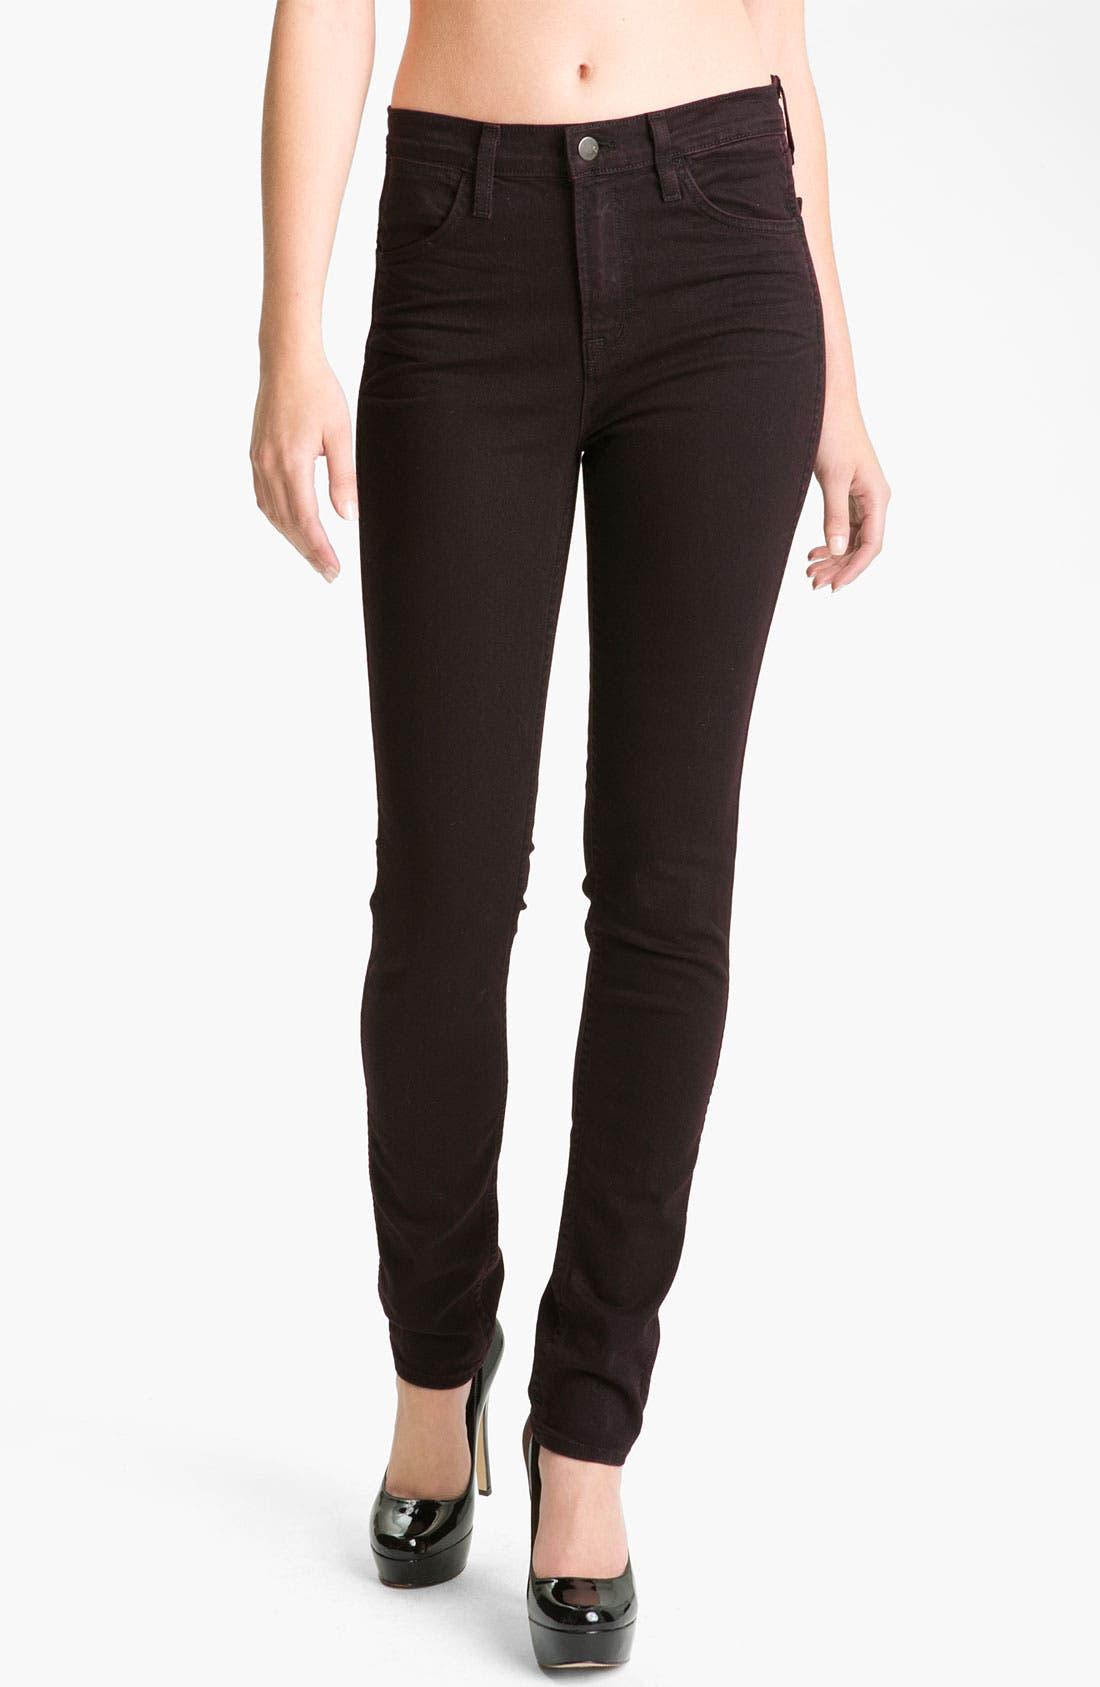 Alternate Image 1 Selected - J Brand 'Sasha' High Rise Skinny Jeans (Noir Red)